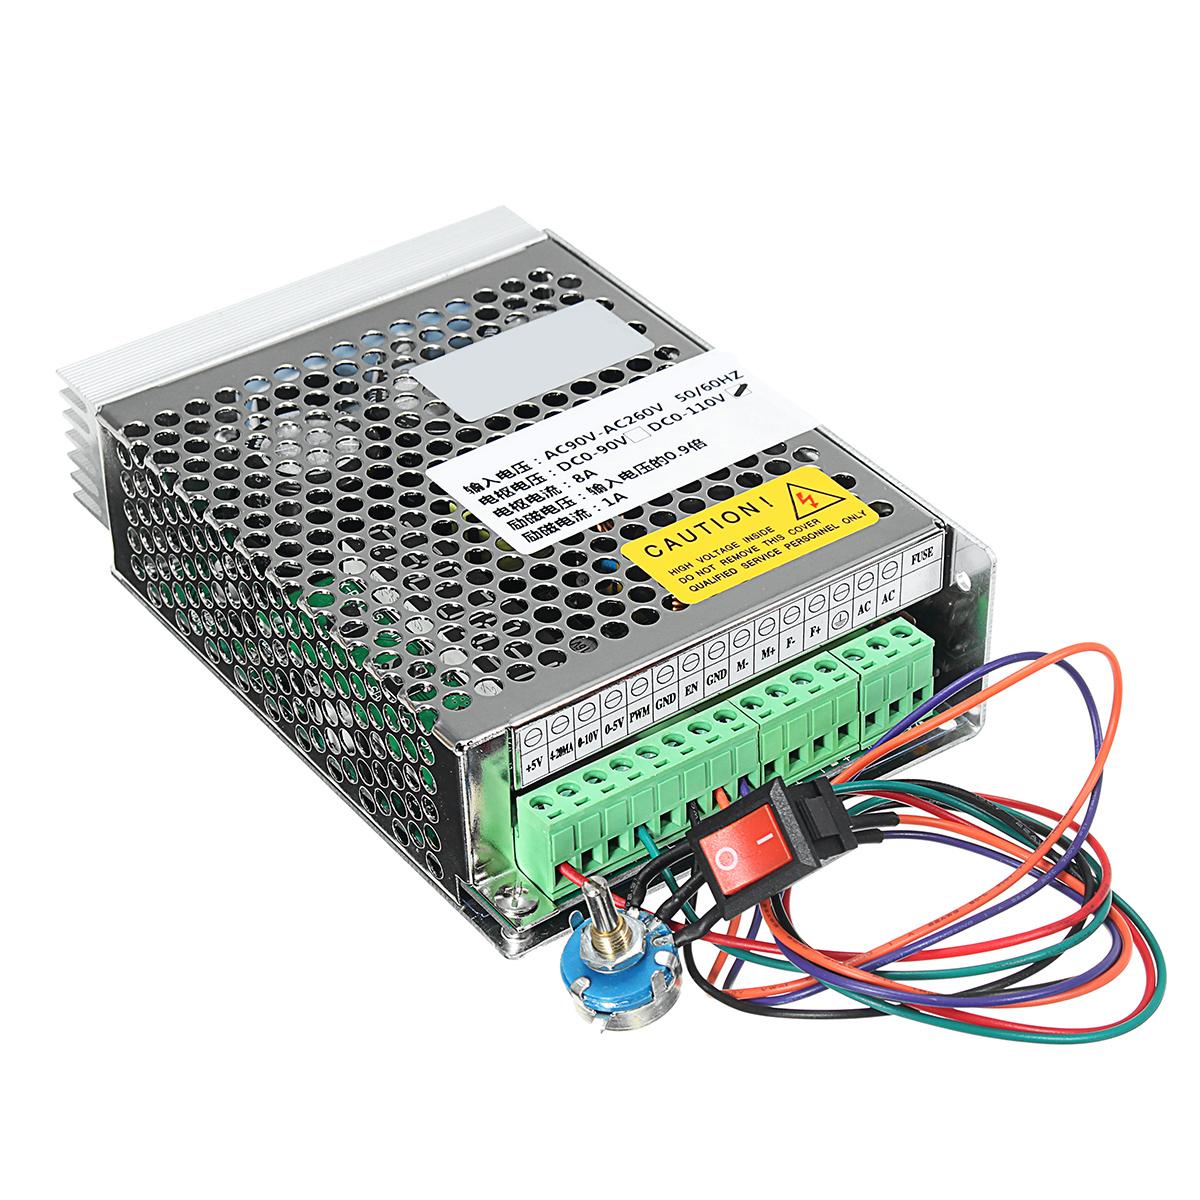 hight resolution of ac90v 260v input dc110v output 8a pwm dc motor speed controller driver speed governor